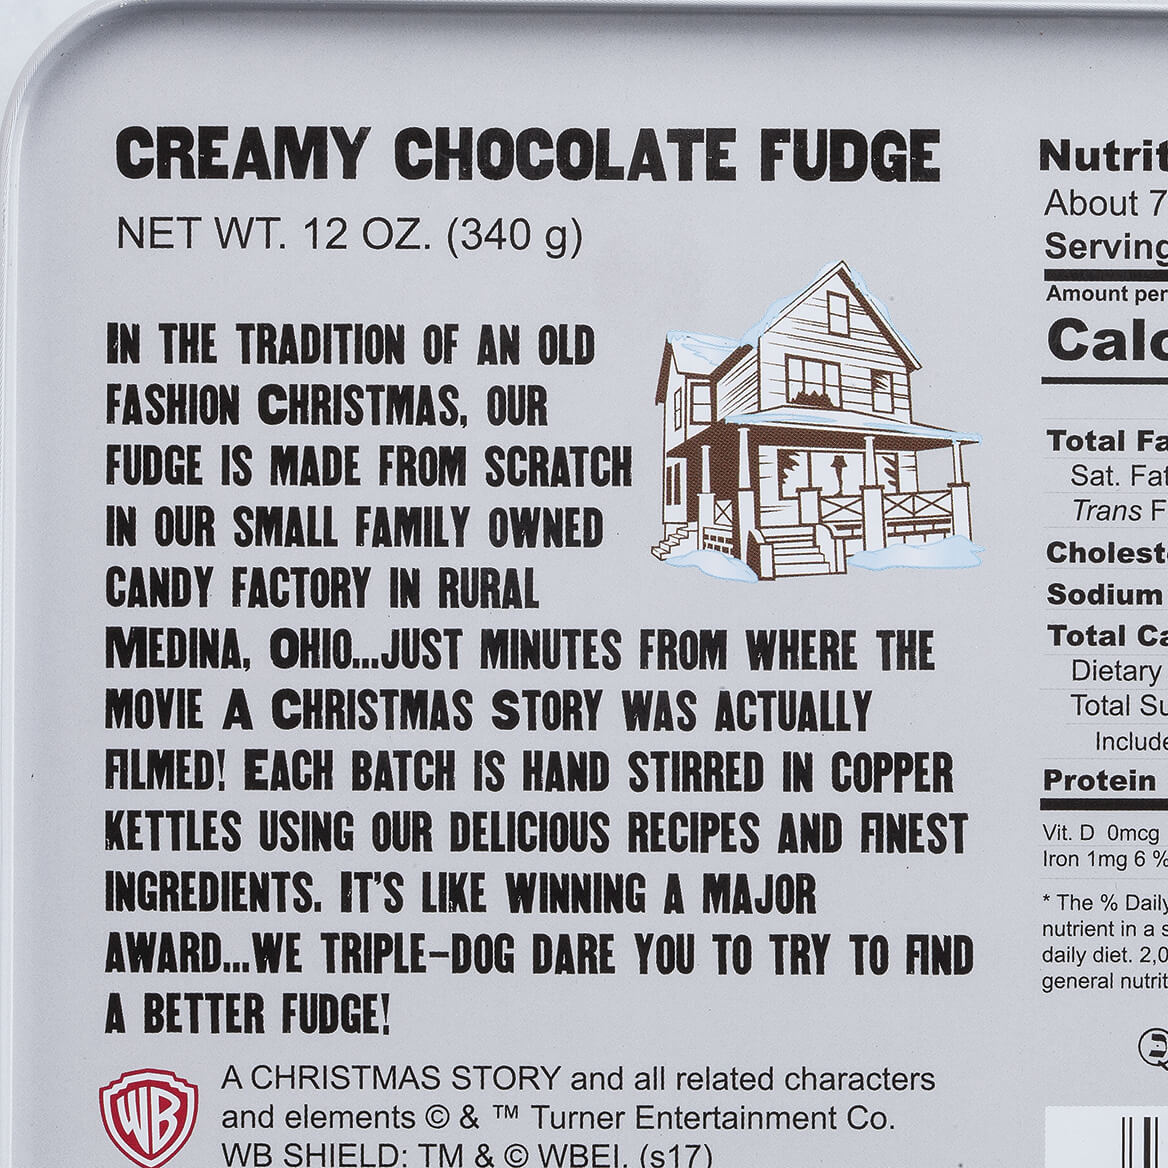 A Christmas Story Fudge Tin, Creamy Chocolate, 12 oz.-368944